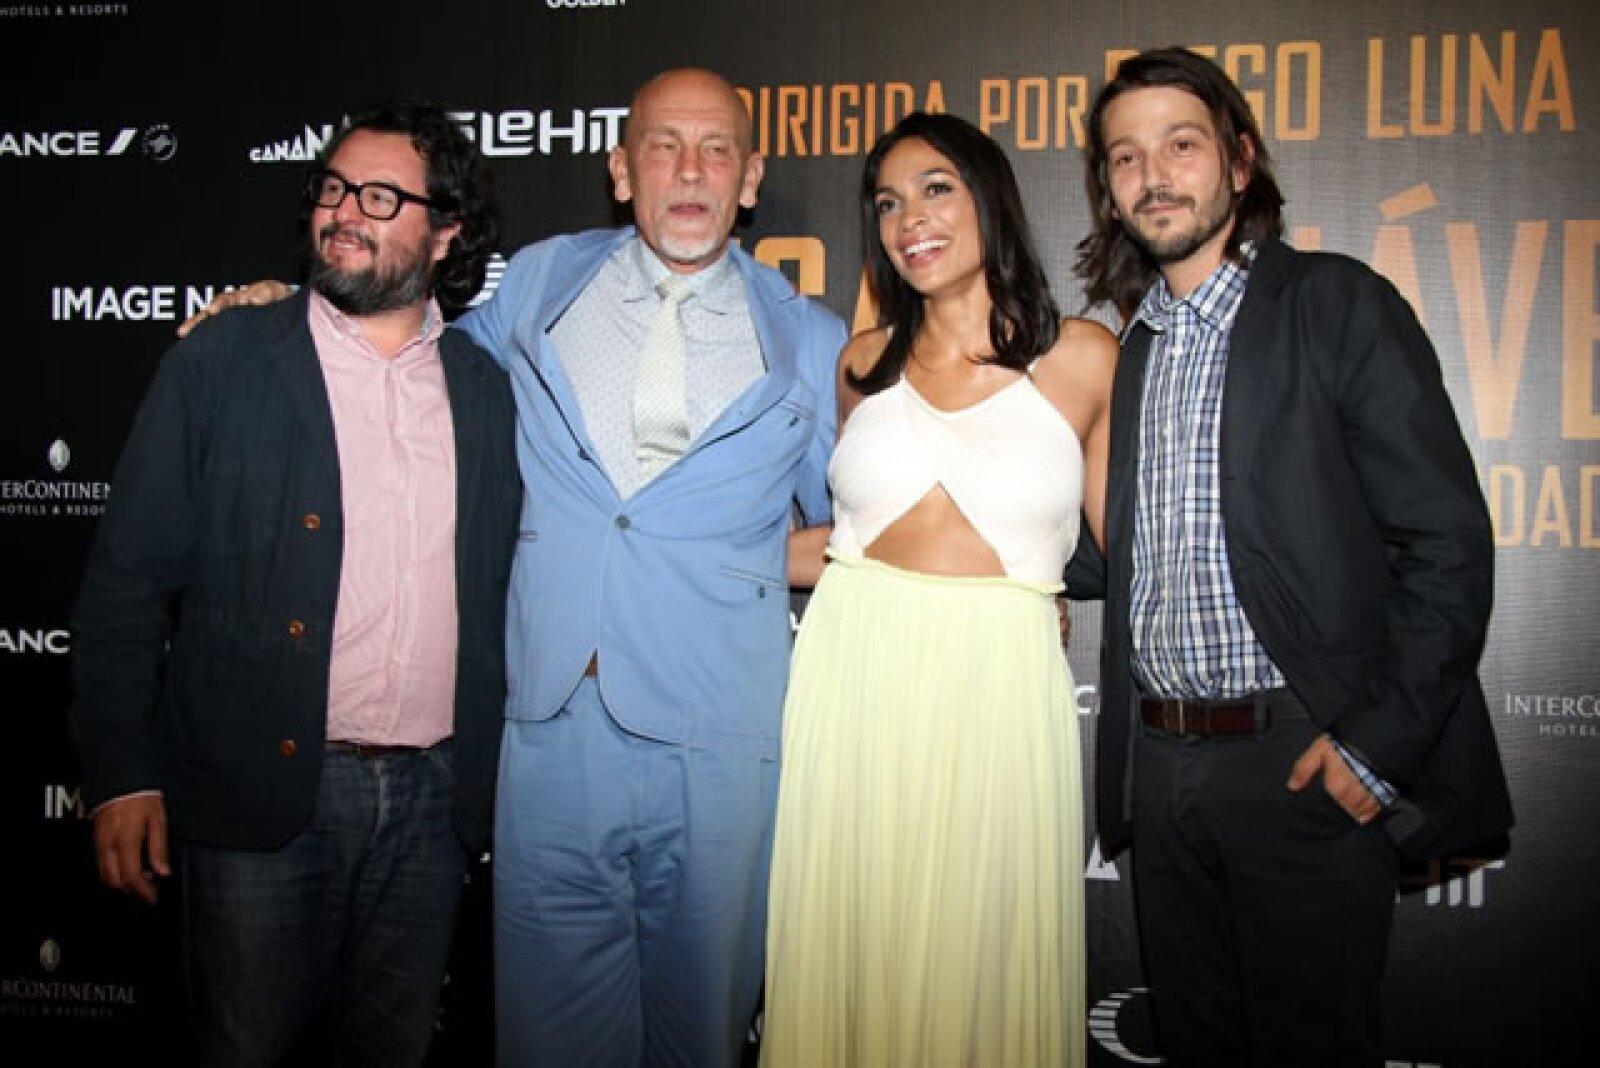 Pablo Cruz, John Malkovich, Rosario Dawson, Diego Luna.